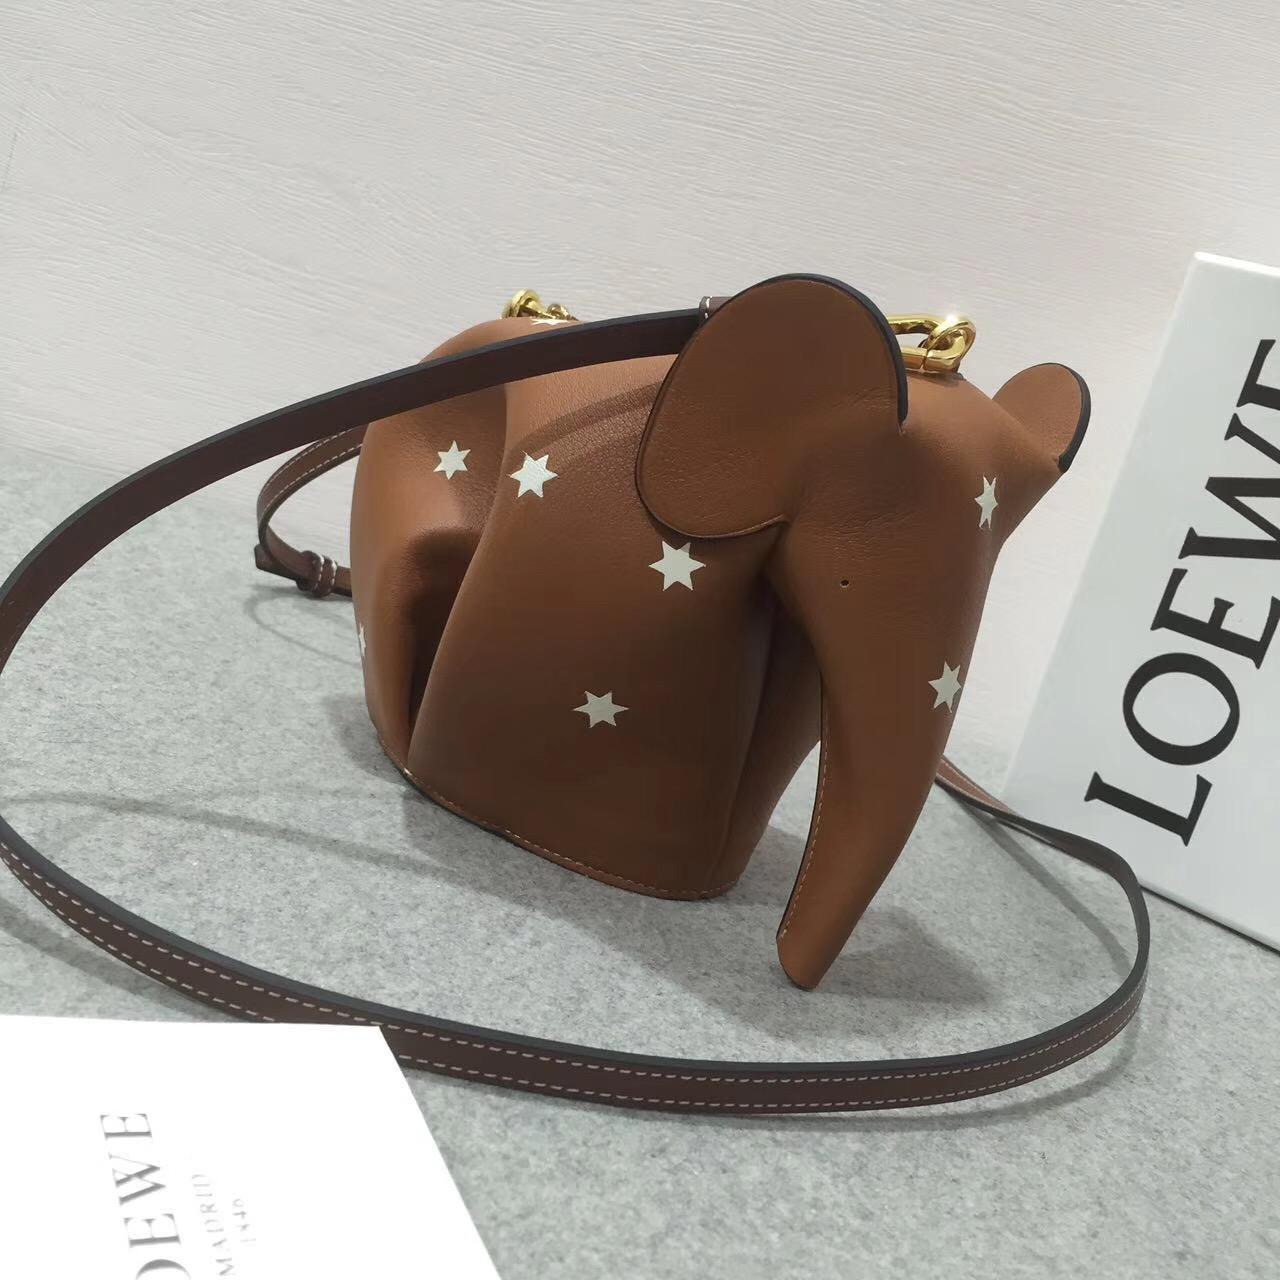 Loewe Elephant Mini Bag Silver 棕色配白色星星 小牛皮